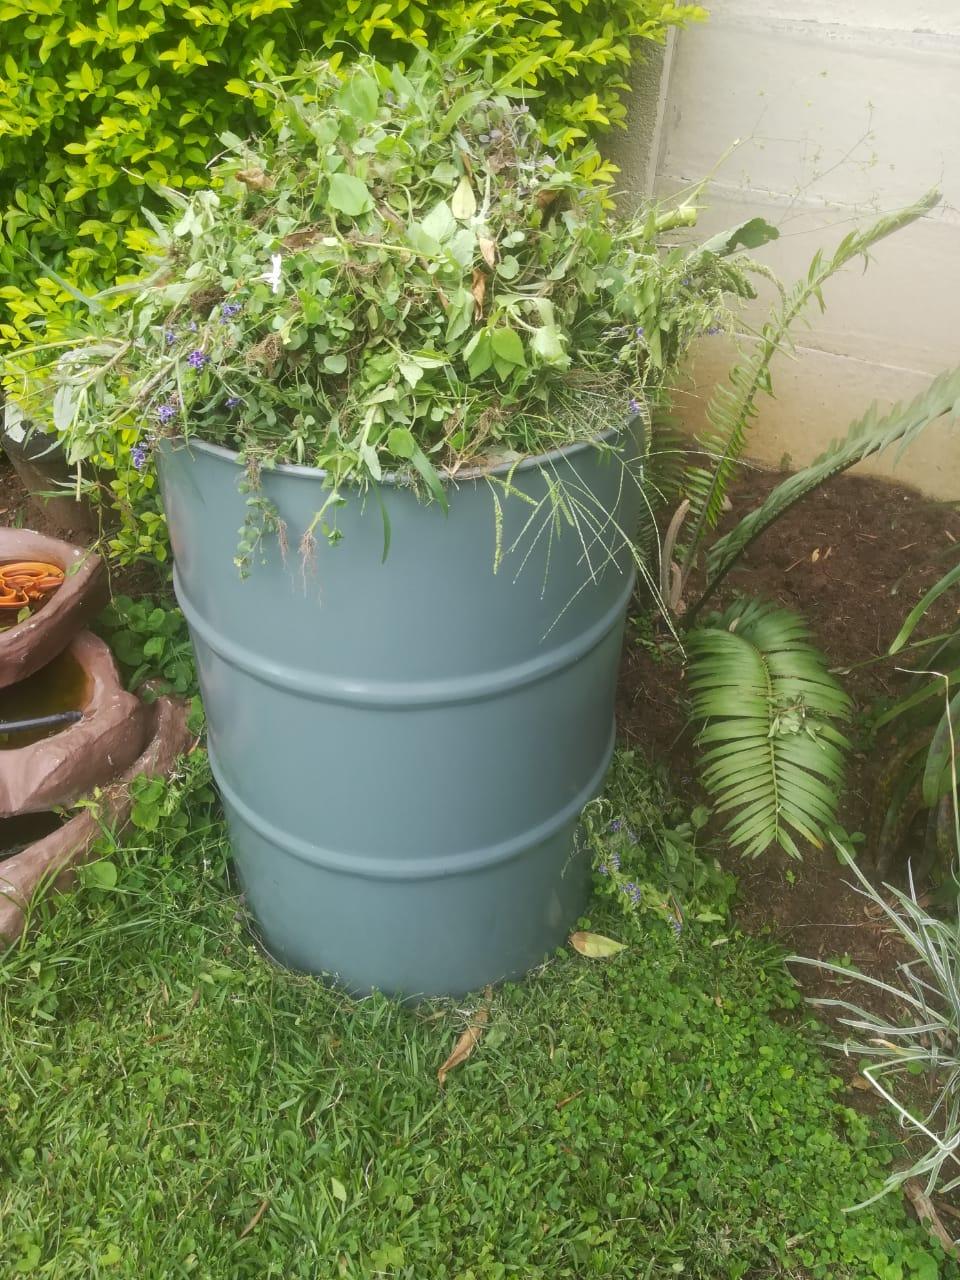 Drum Guys - Garden Refuse Removal.